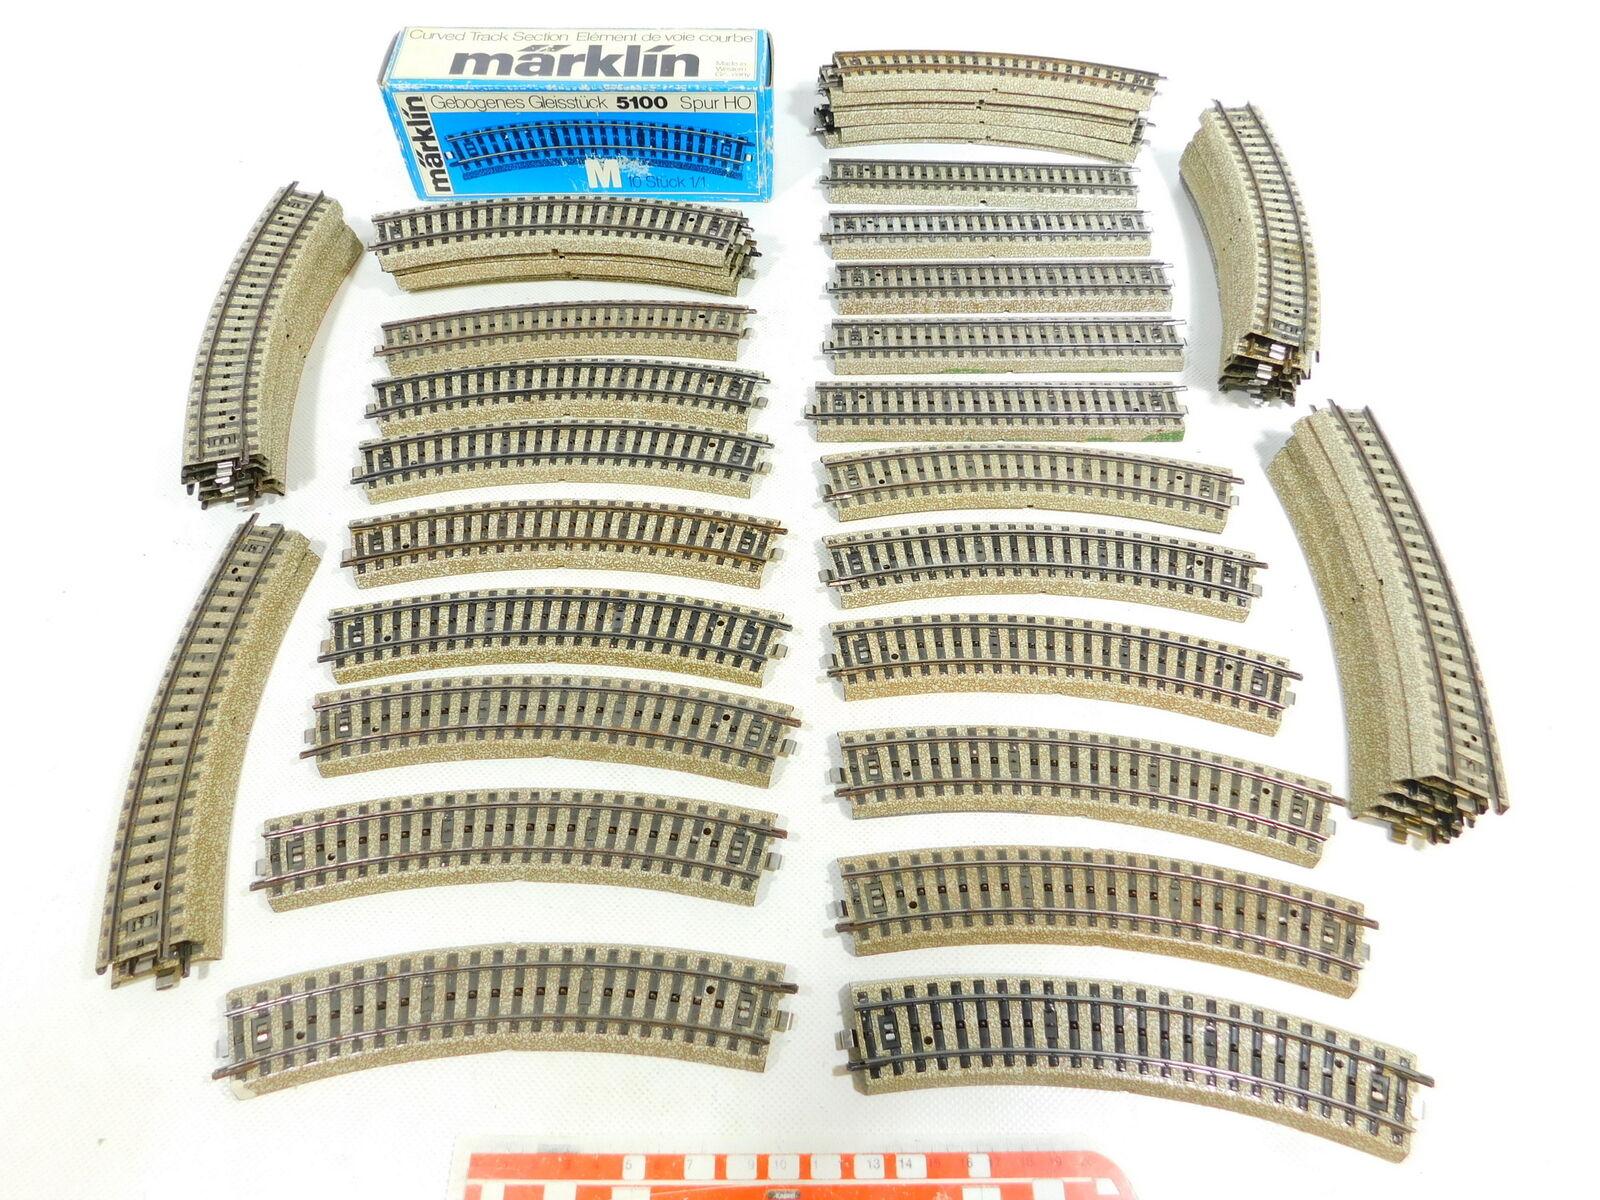 Bx523-3  49x Märklin h0 ac M-vía ferrocarril 5100 5106; buena elección 2.; 1x OVP